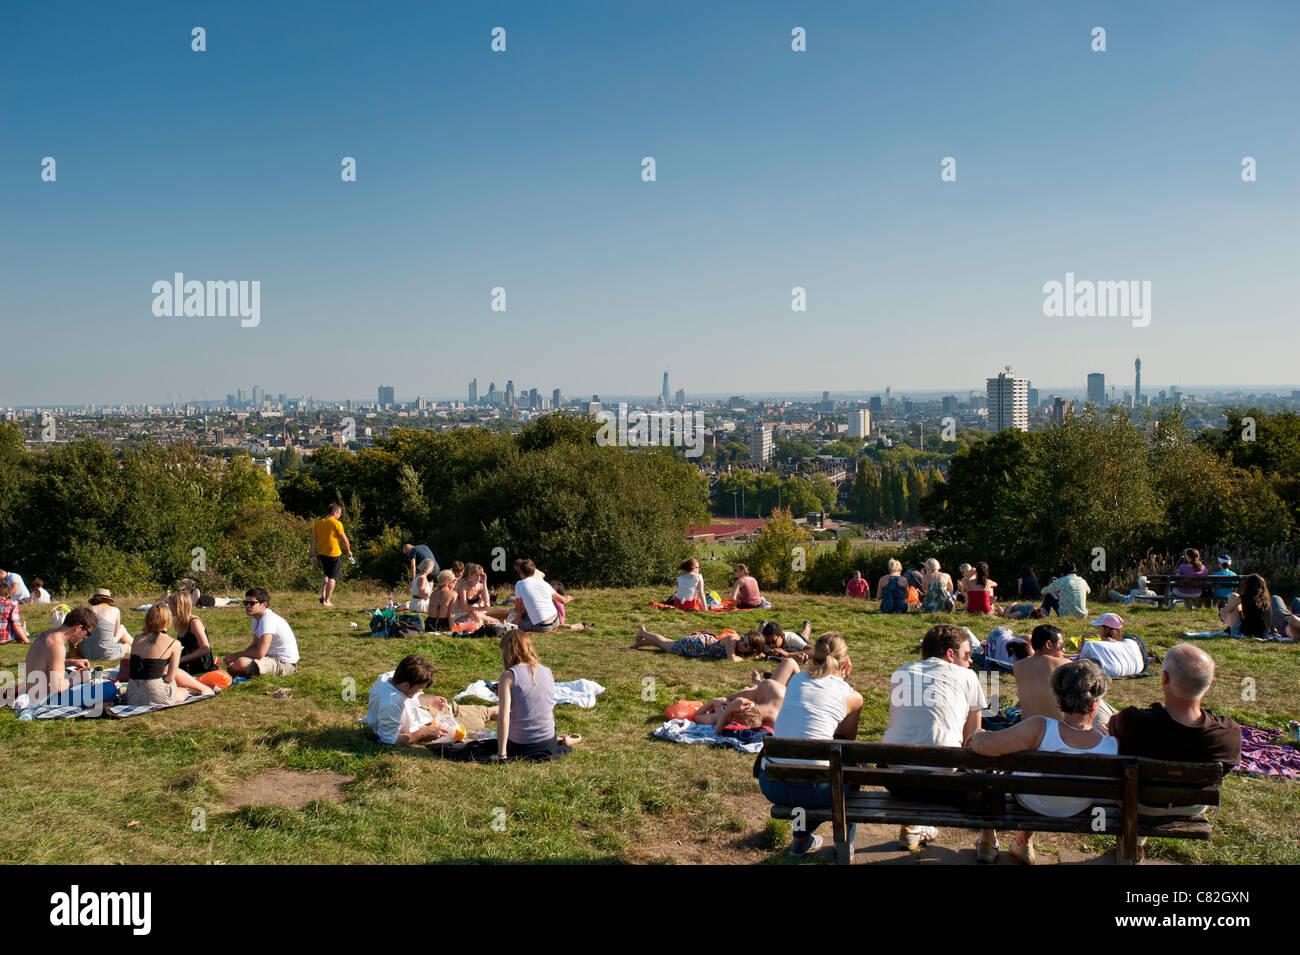 Hampstead Heath, NW3, London, United Kingdom - Stock Image